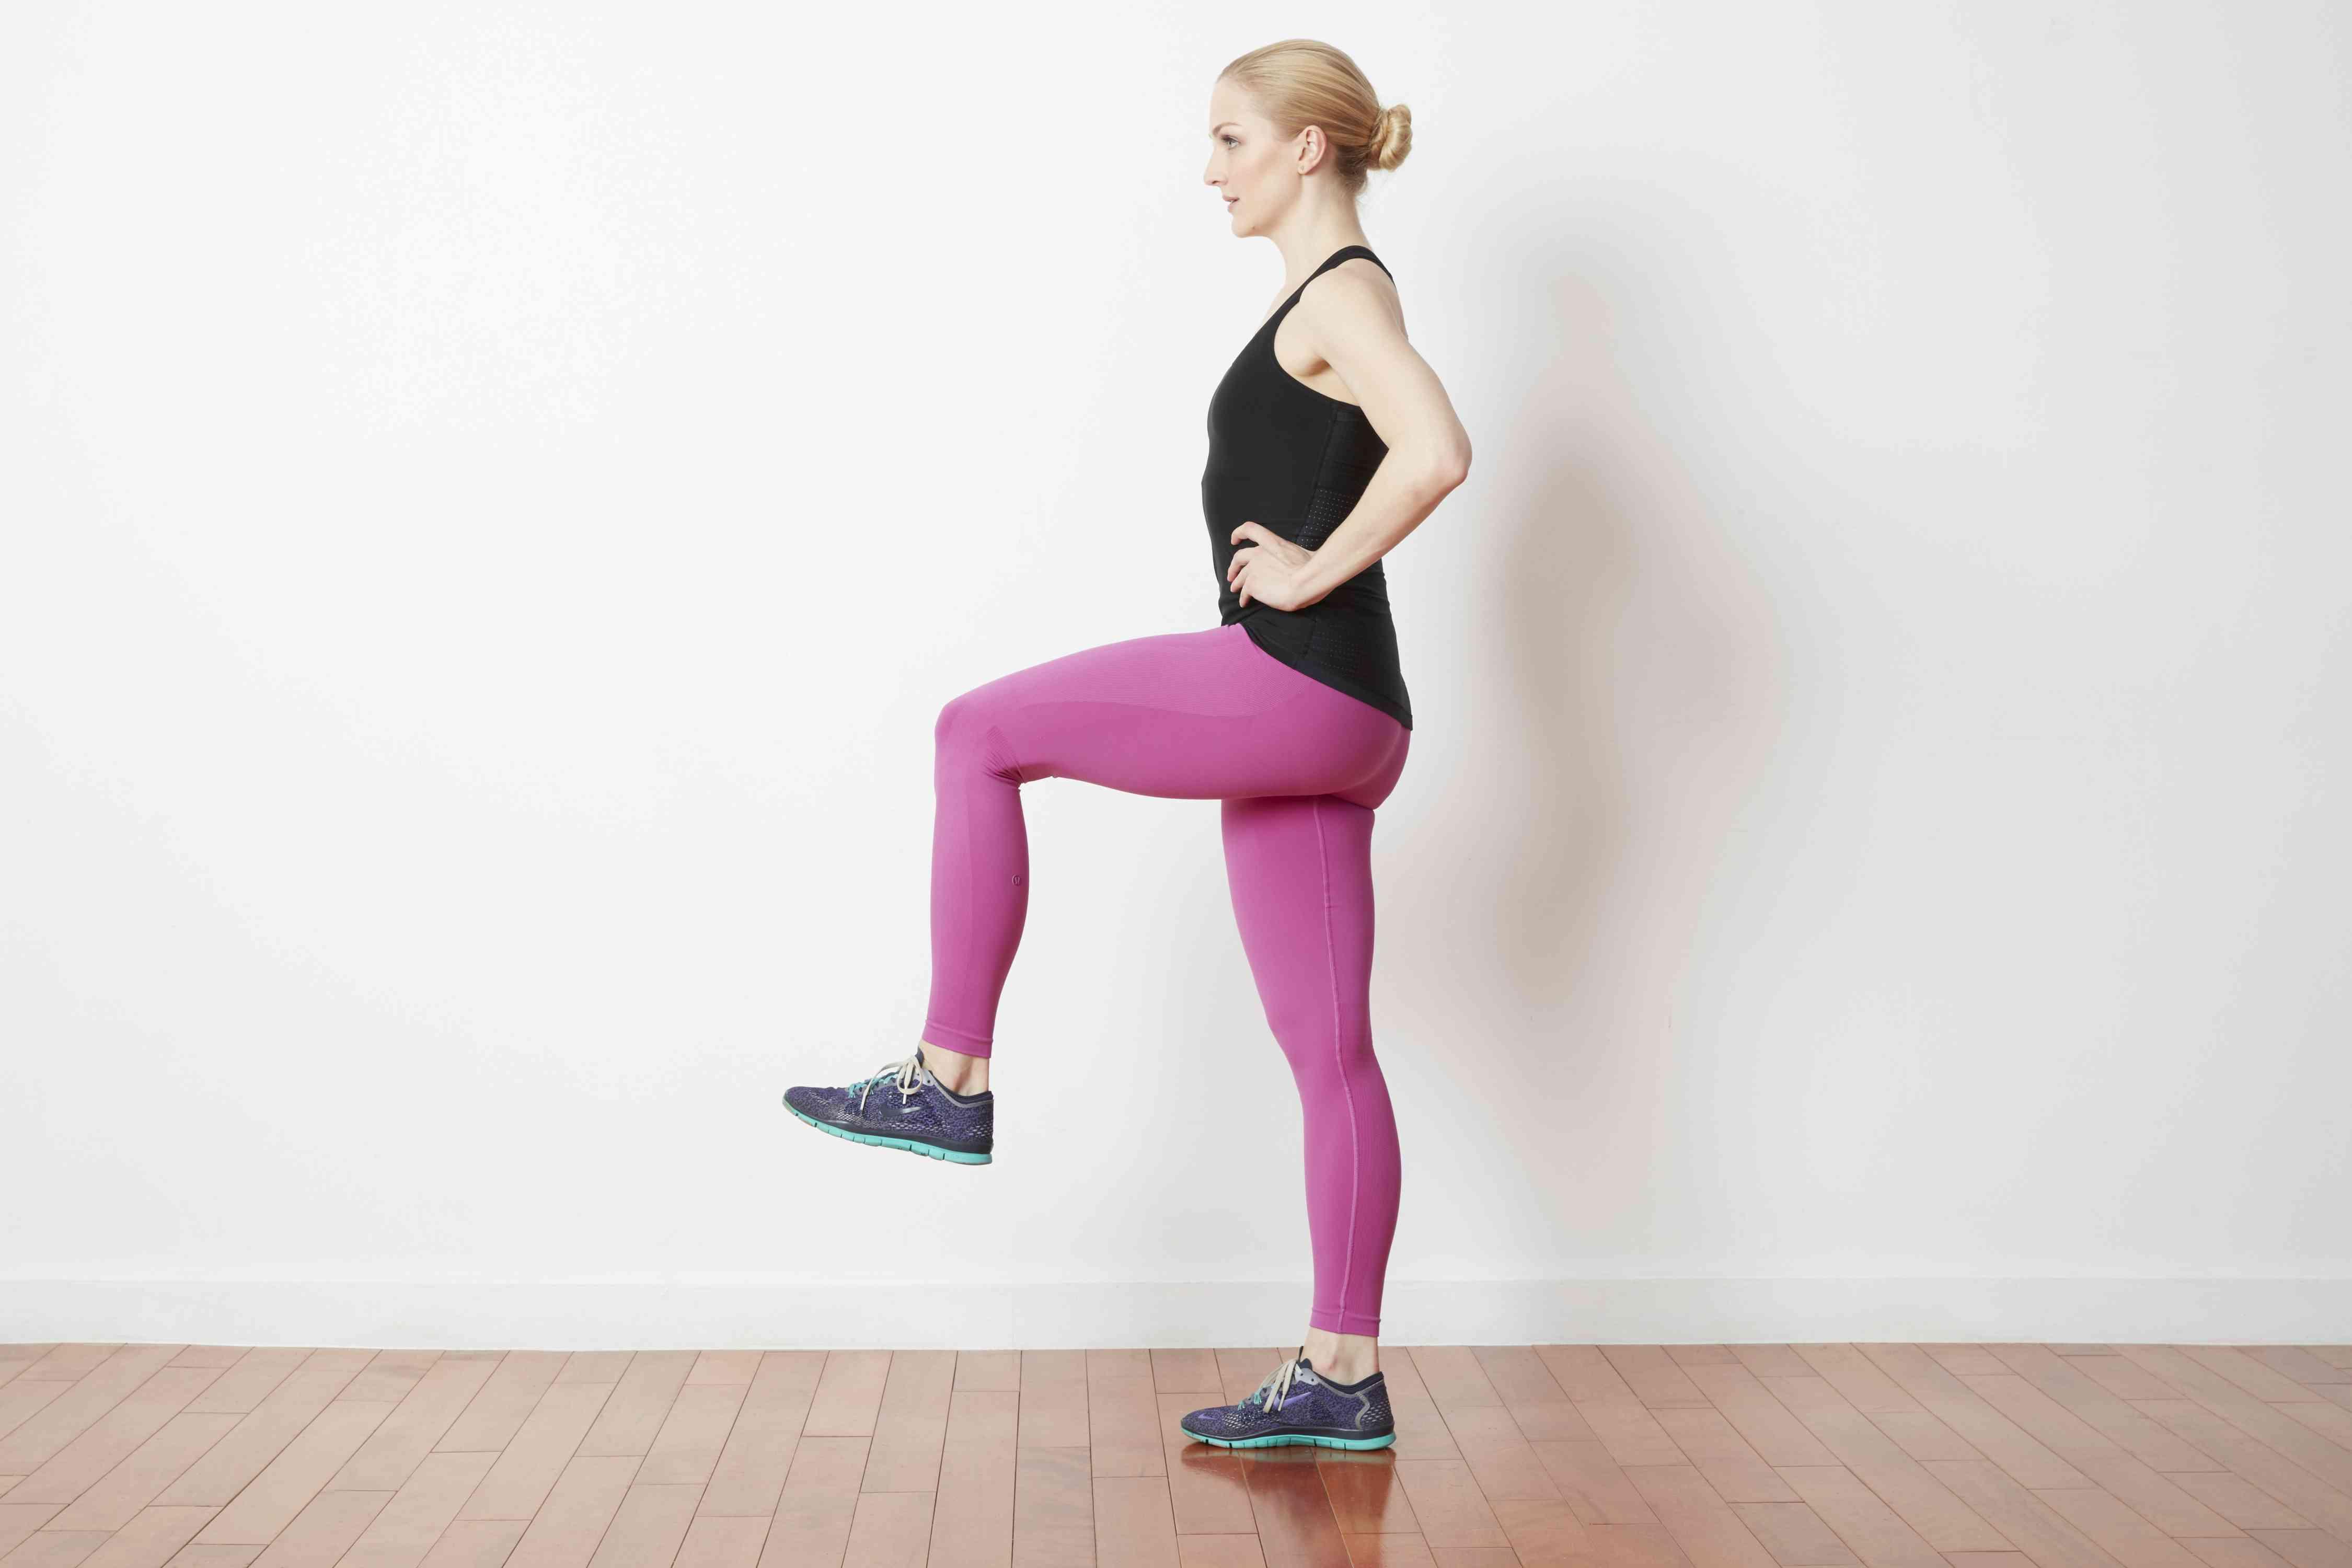 Woman balancing on one leg with knee raised